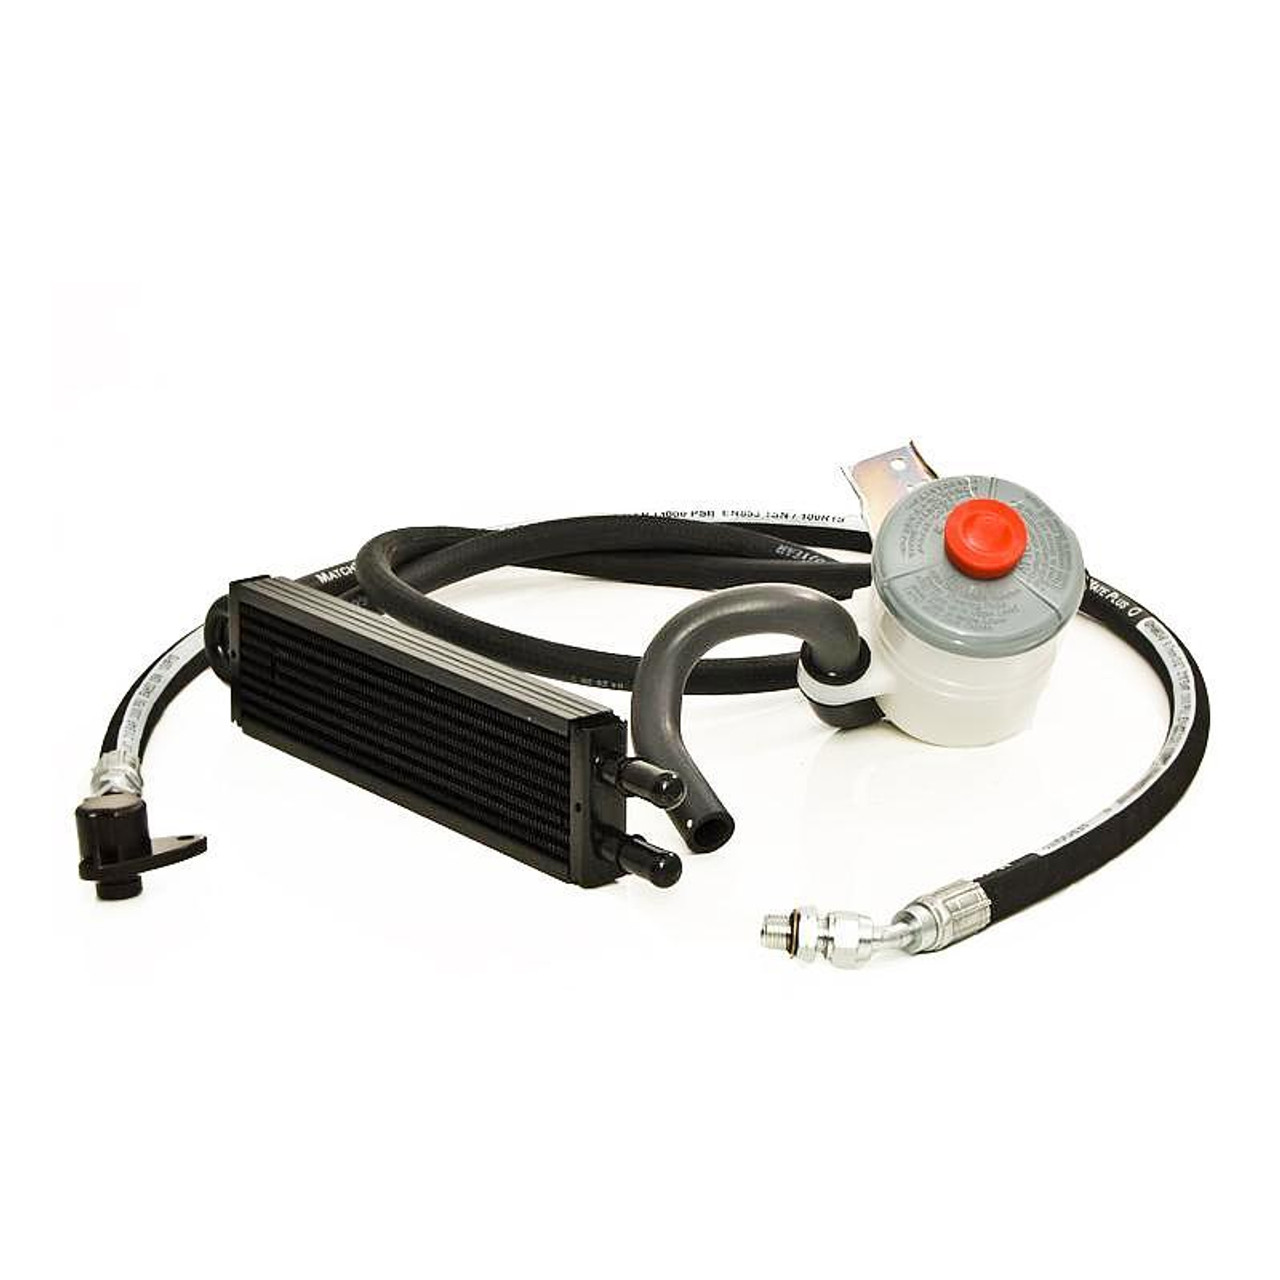 Hybrid Racing - RHD Power Steering Conversion Kit (92-00' Civic | 94-01'  Integra)